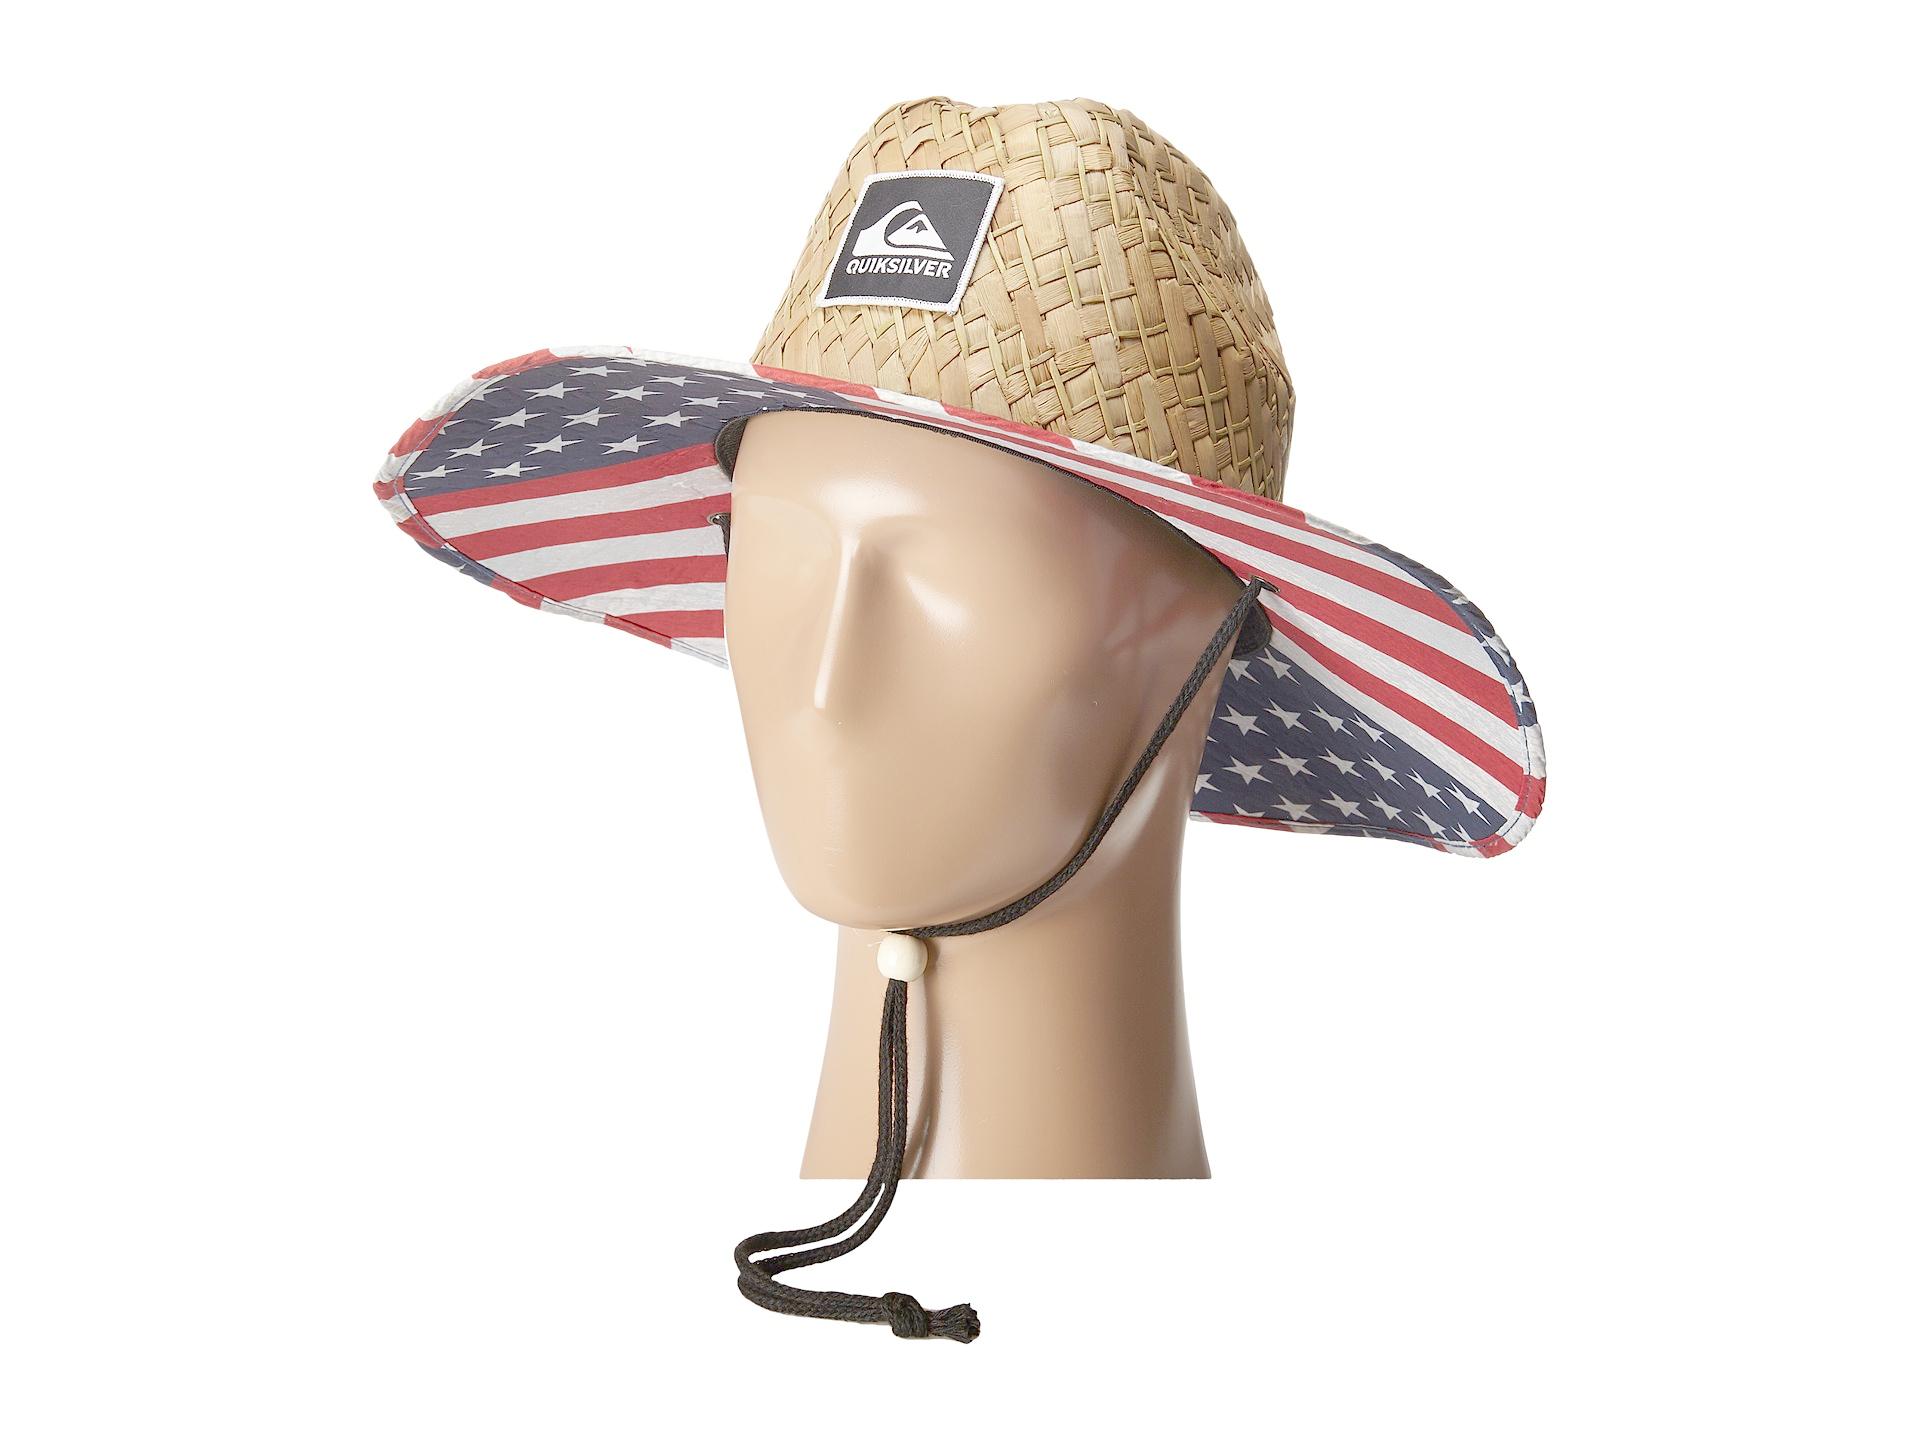 e280cbc2 Quiksilver Outsider Lifeguard Hat for Men - Lyst